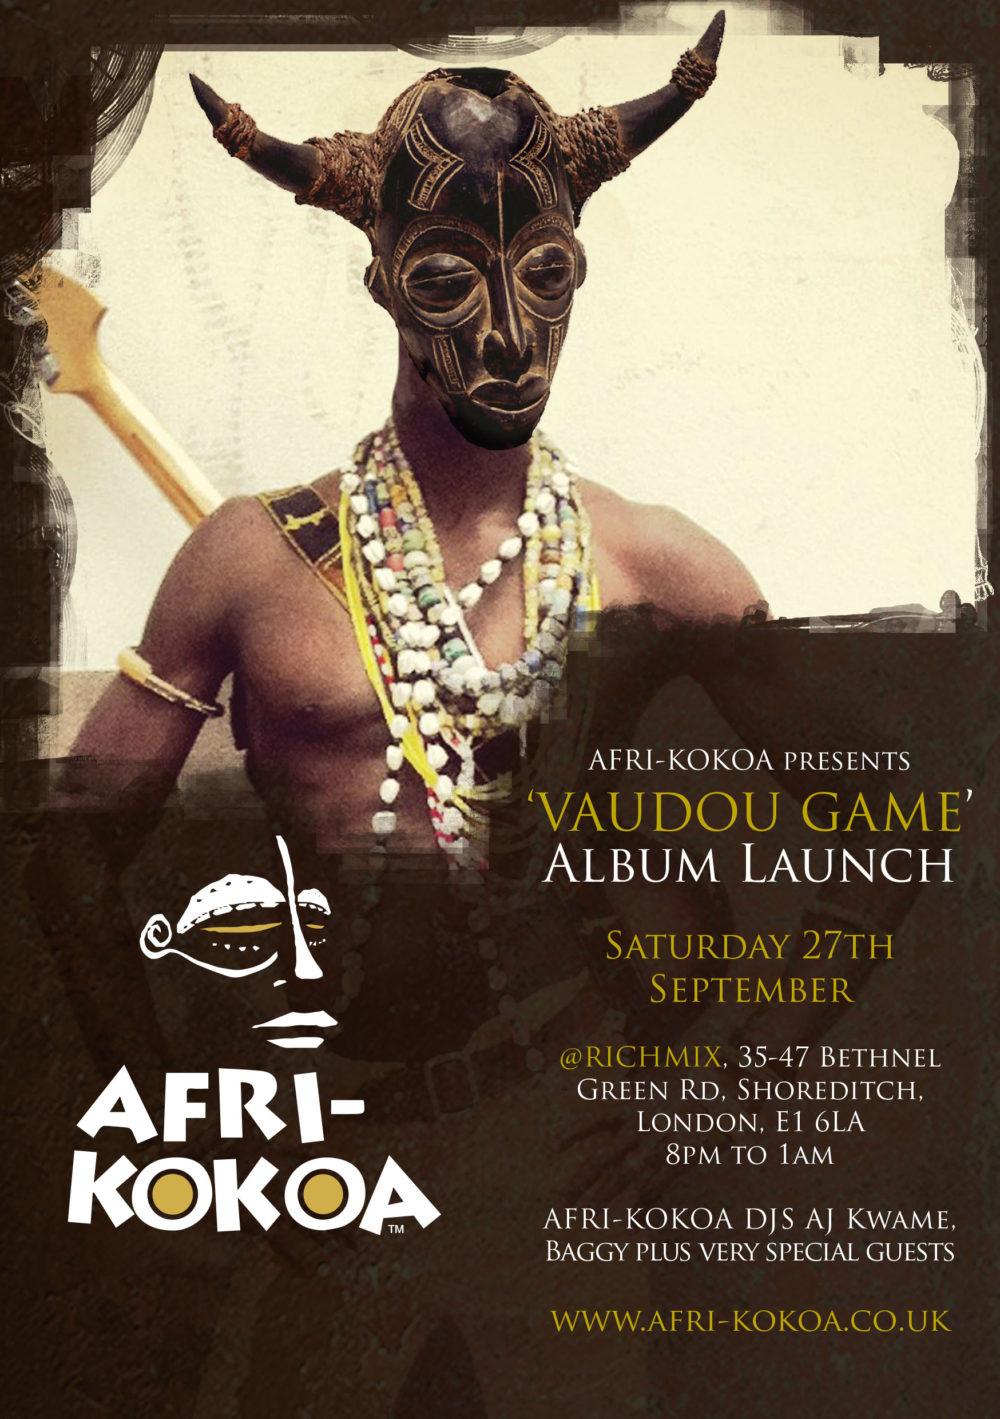 Afri-Kokoa